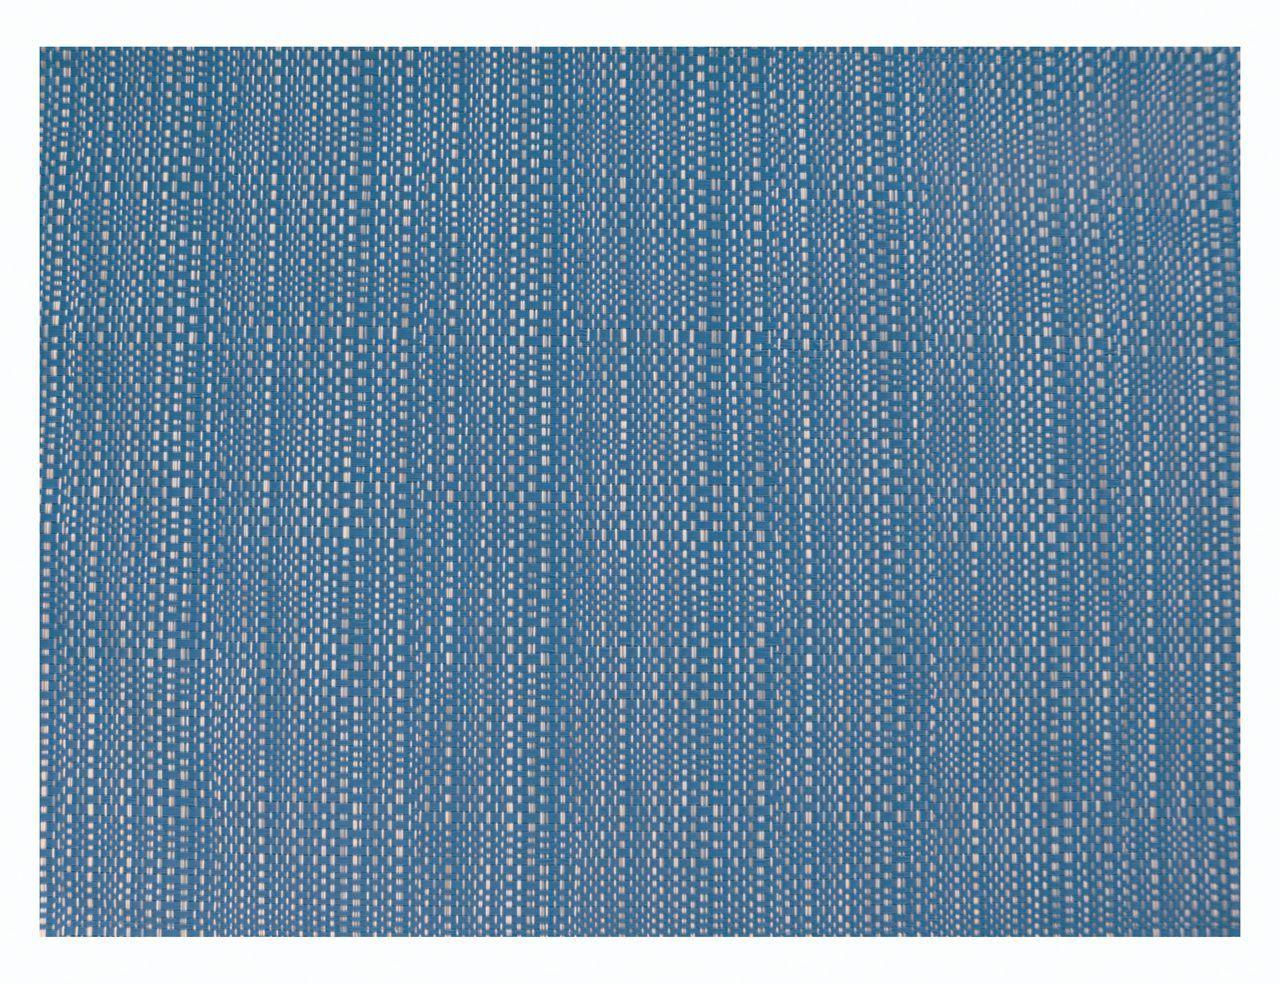 set de table effet paille tress e canna bleu acier 45x33 d co en bleu pinterest bleu. Black Bedroom Furniture Sets. Home Design Ideas